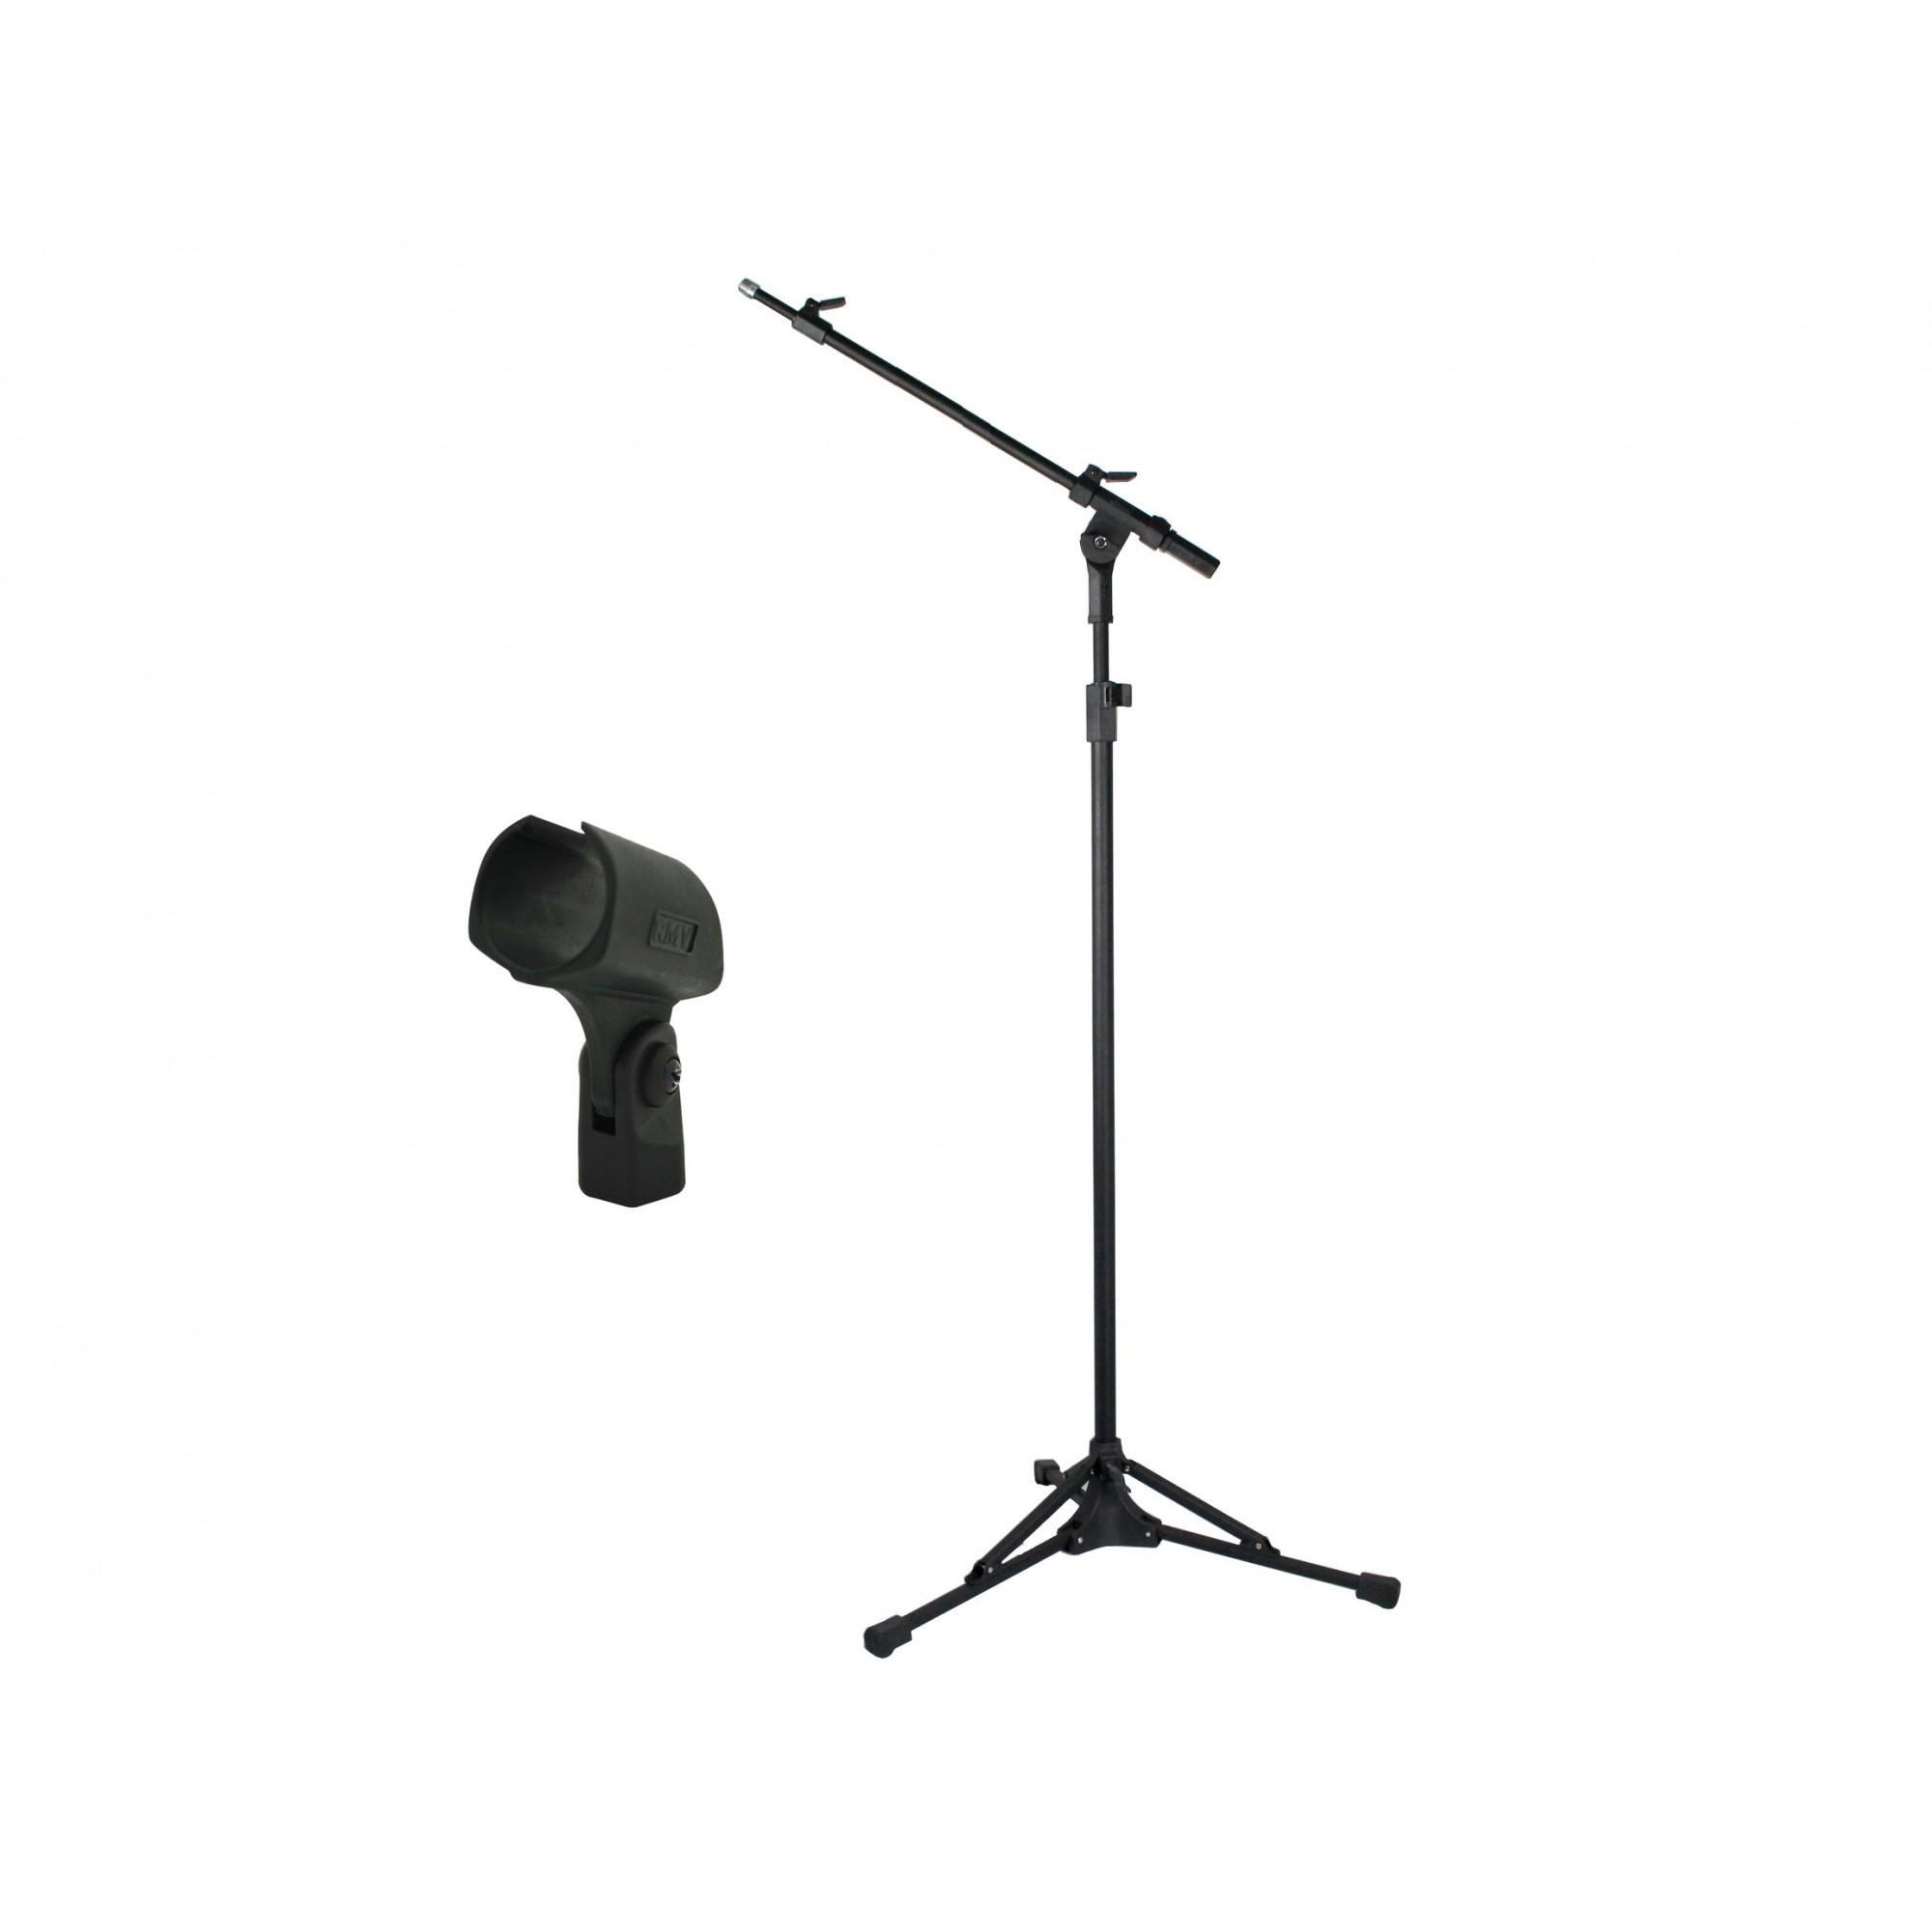 Pedestal Para Microfone + Cachimbo 100 - 155cm  Rmv PSU0090